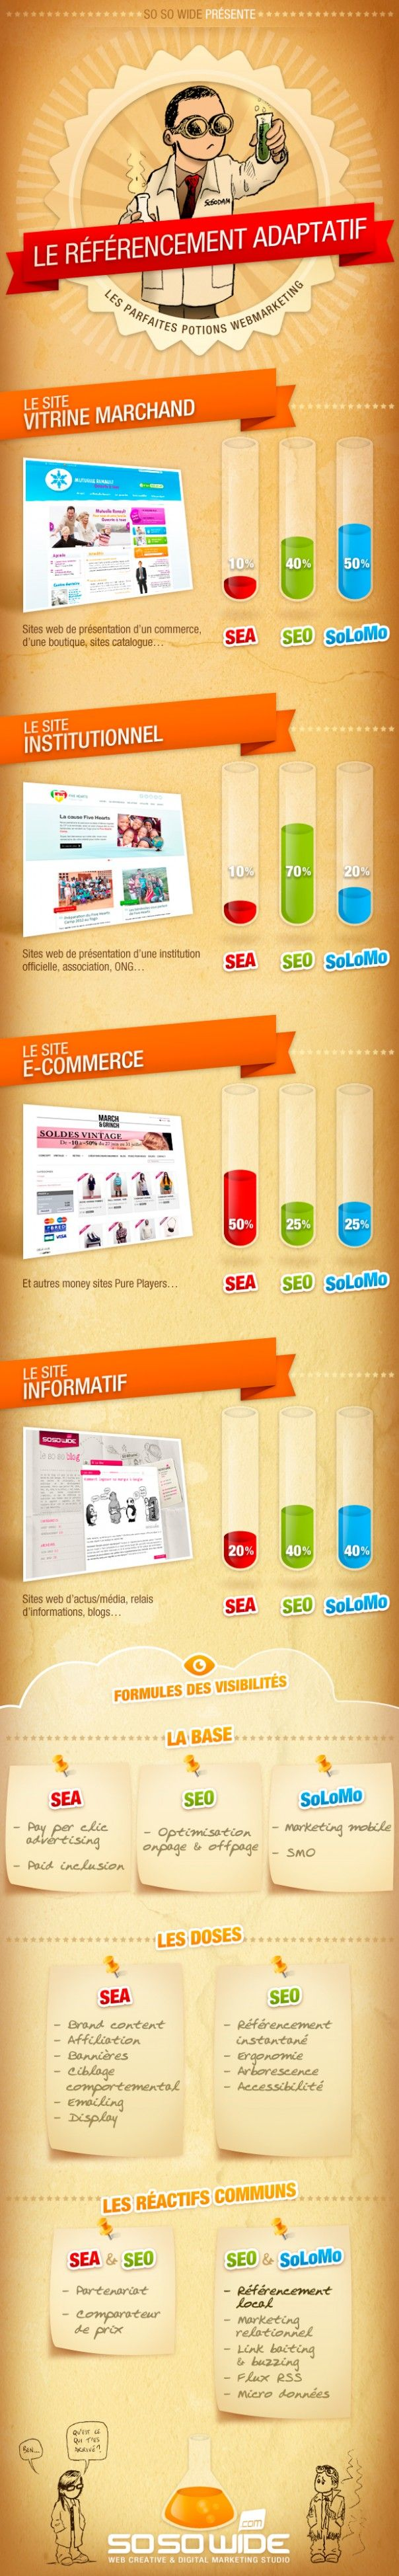 1000 Ideas About Site Vitrine On Pinterest Web Design Design